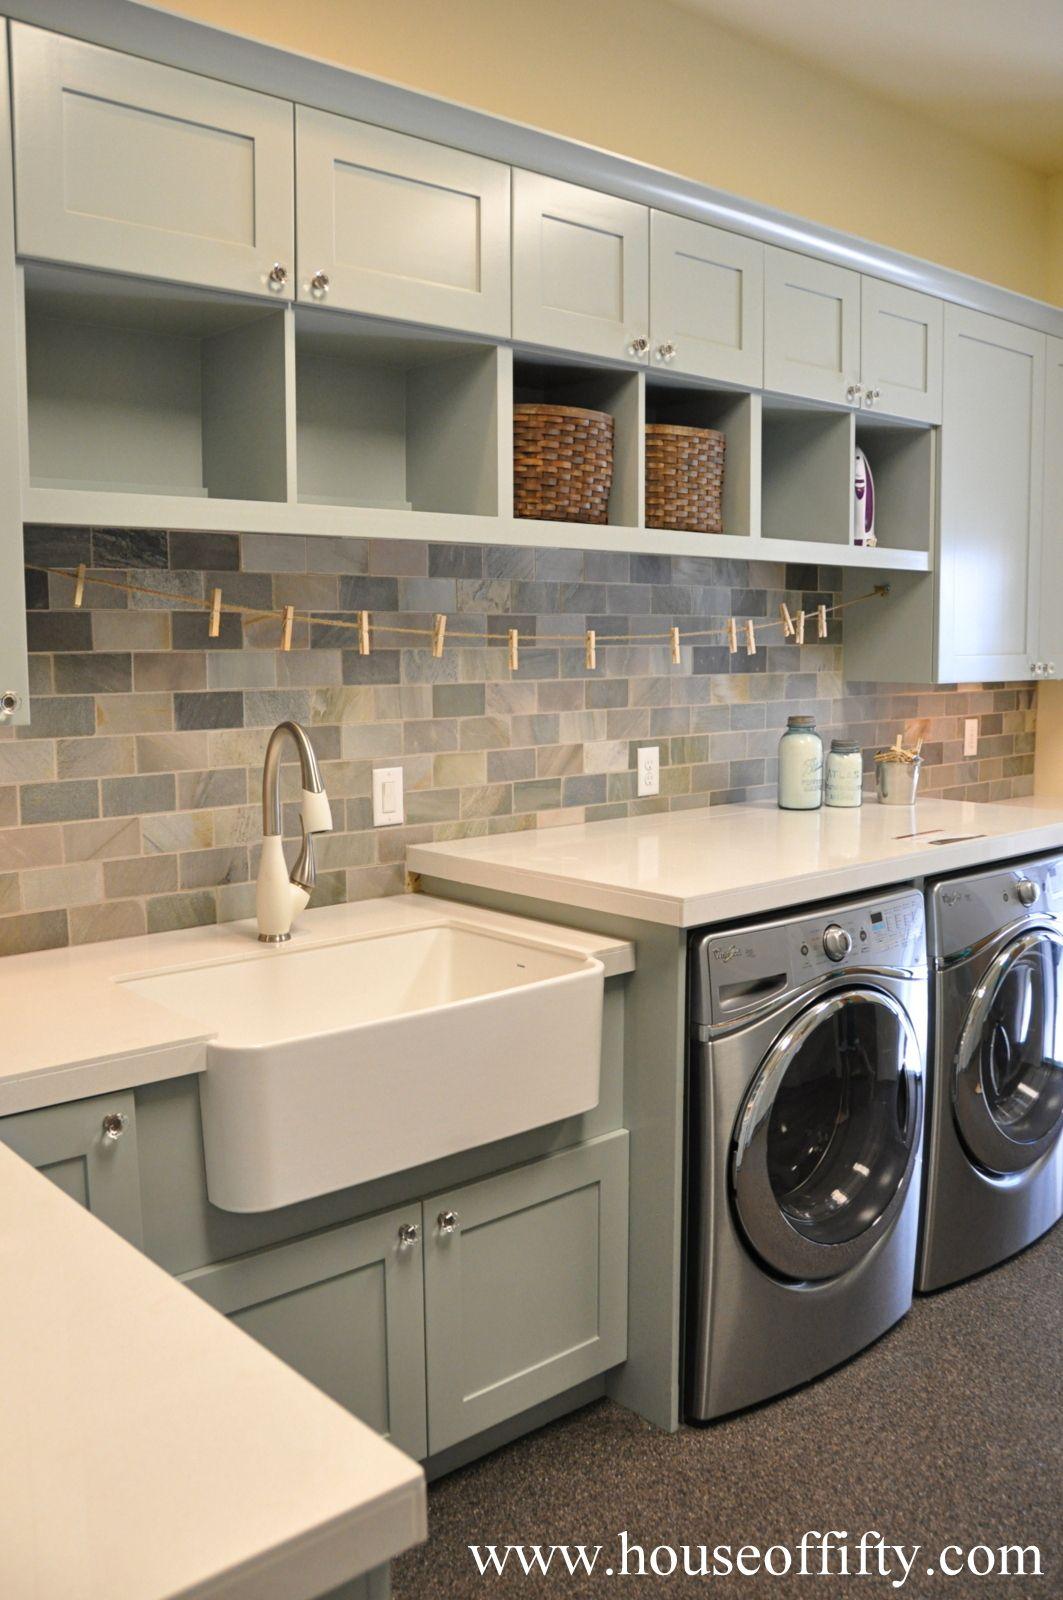 laundry room | let's do laundry | Pinterest | Lavaderos, Lavar y ...